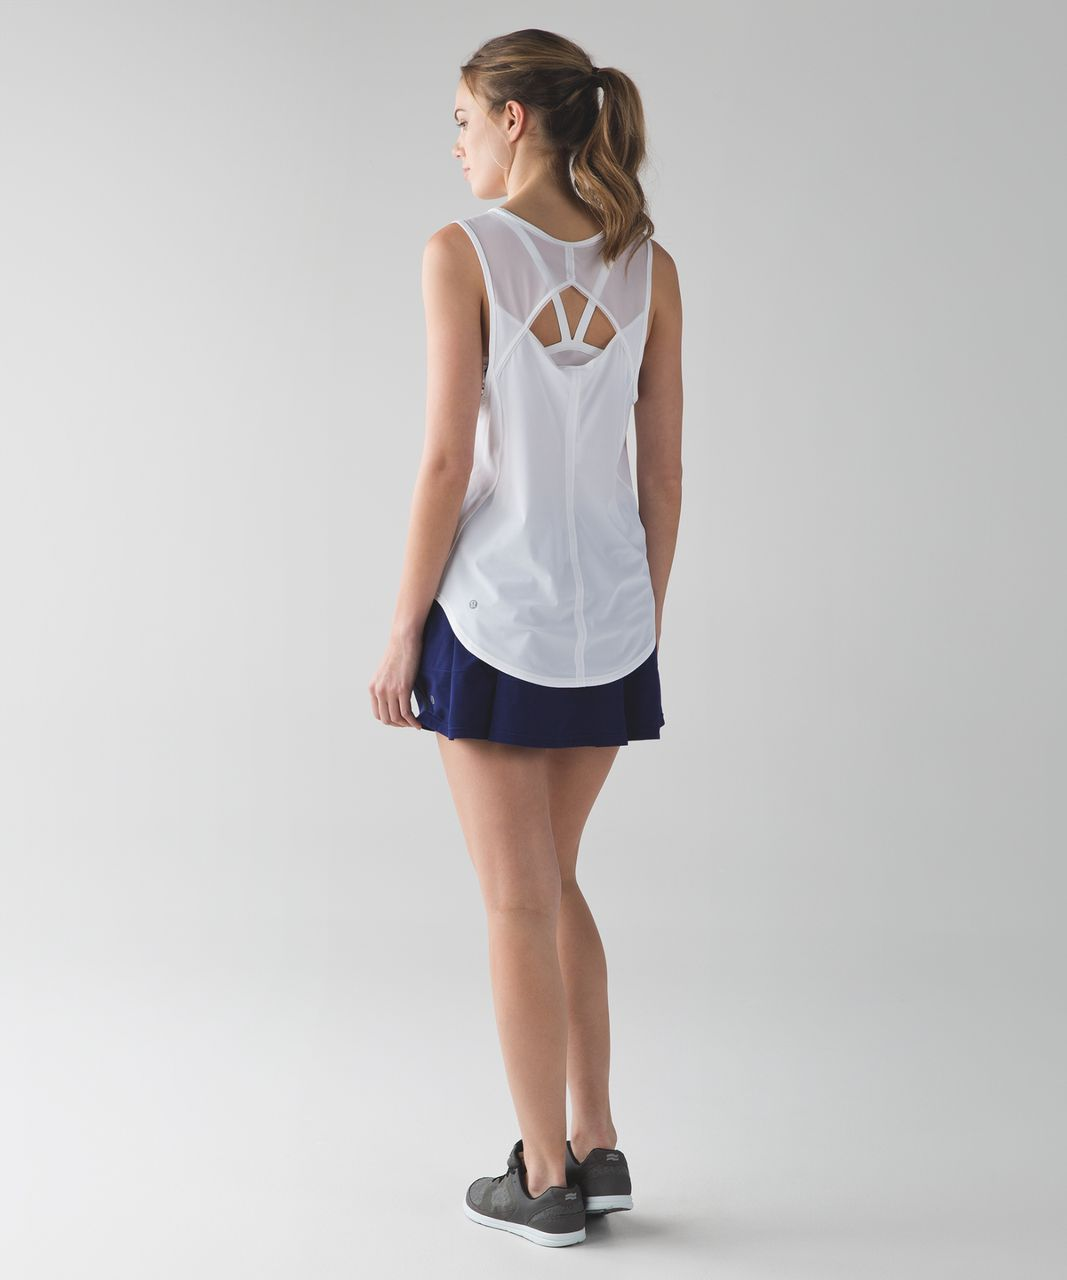 Lululemon Pace Rival Skirt II (Regular) (4-way Stretch ) - Hero Blue